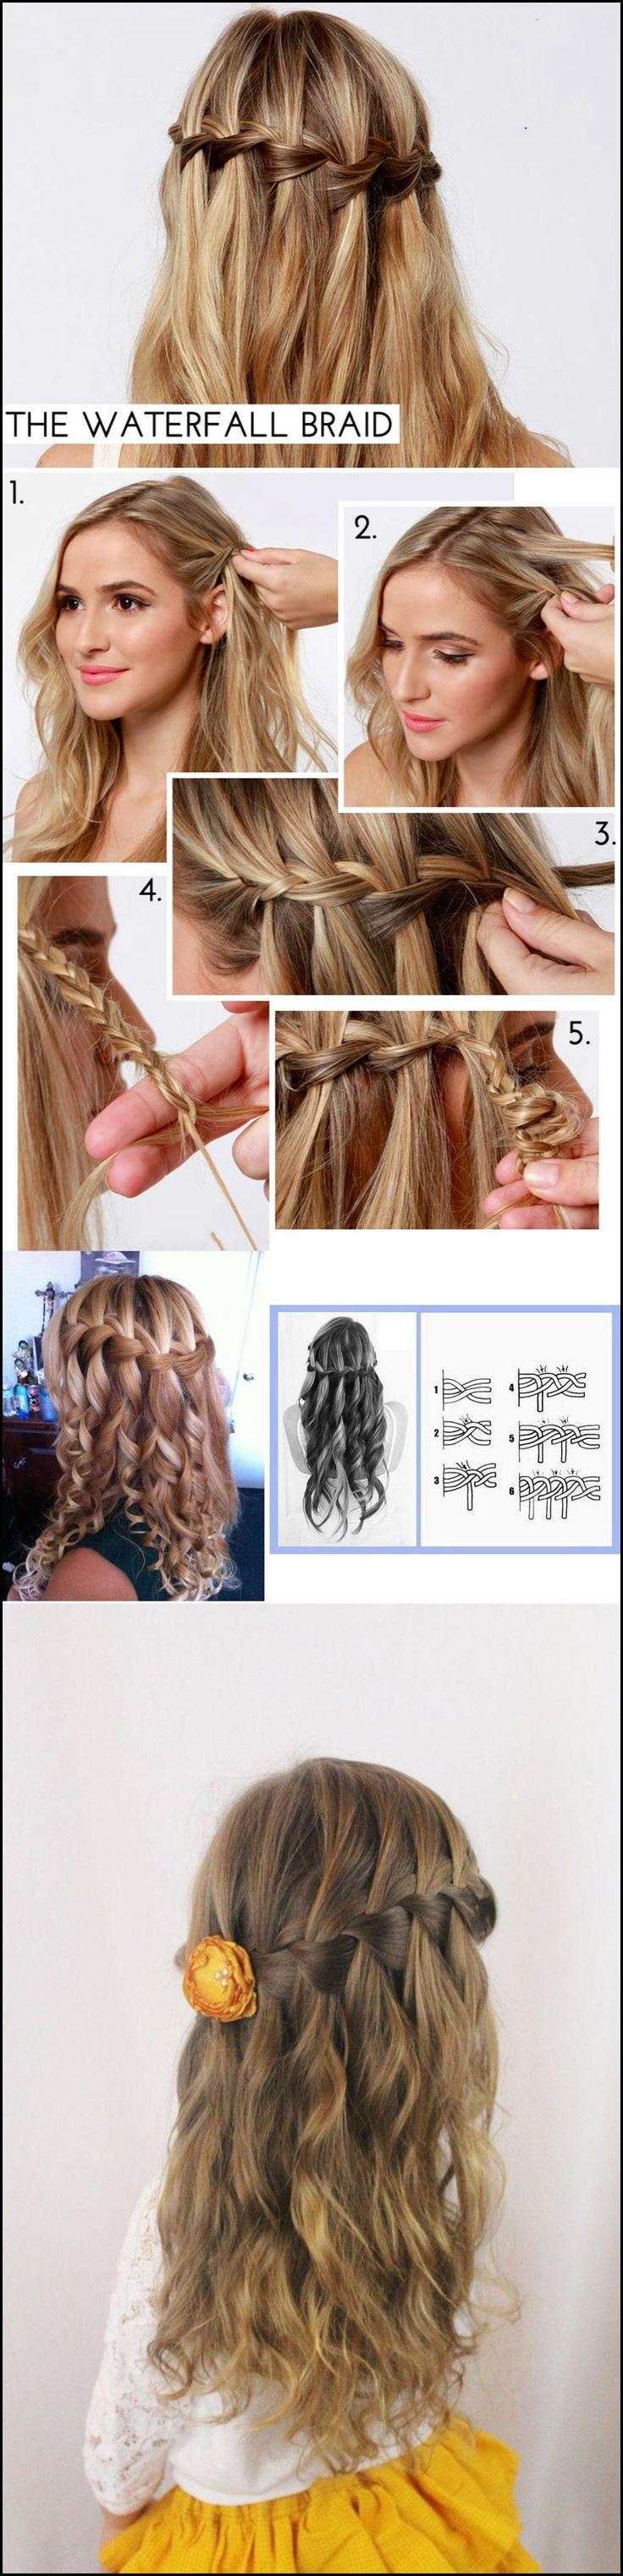 Beautiful waterfall braid #hairstyle --> http://wonderfuldiy.com/wonderful-diy-waterfall-braid-hairstyle/